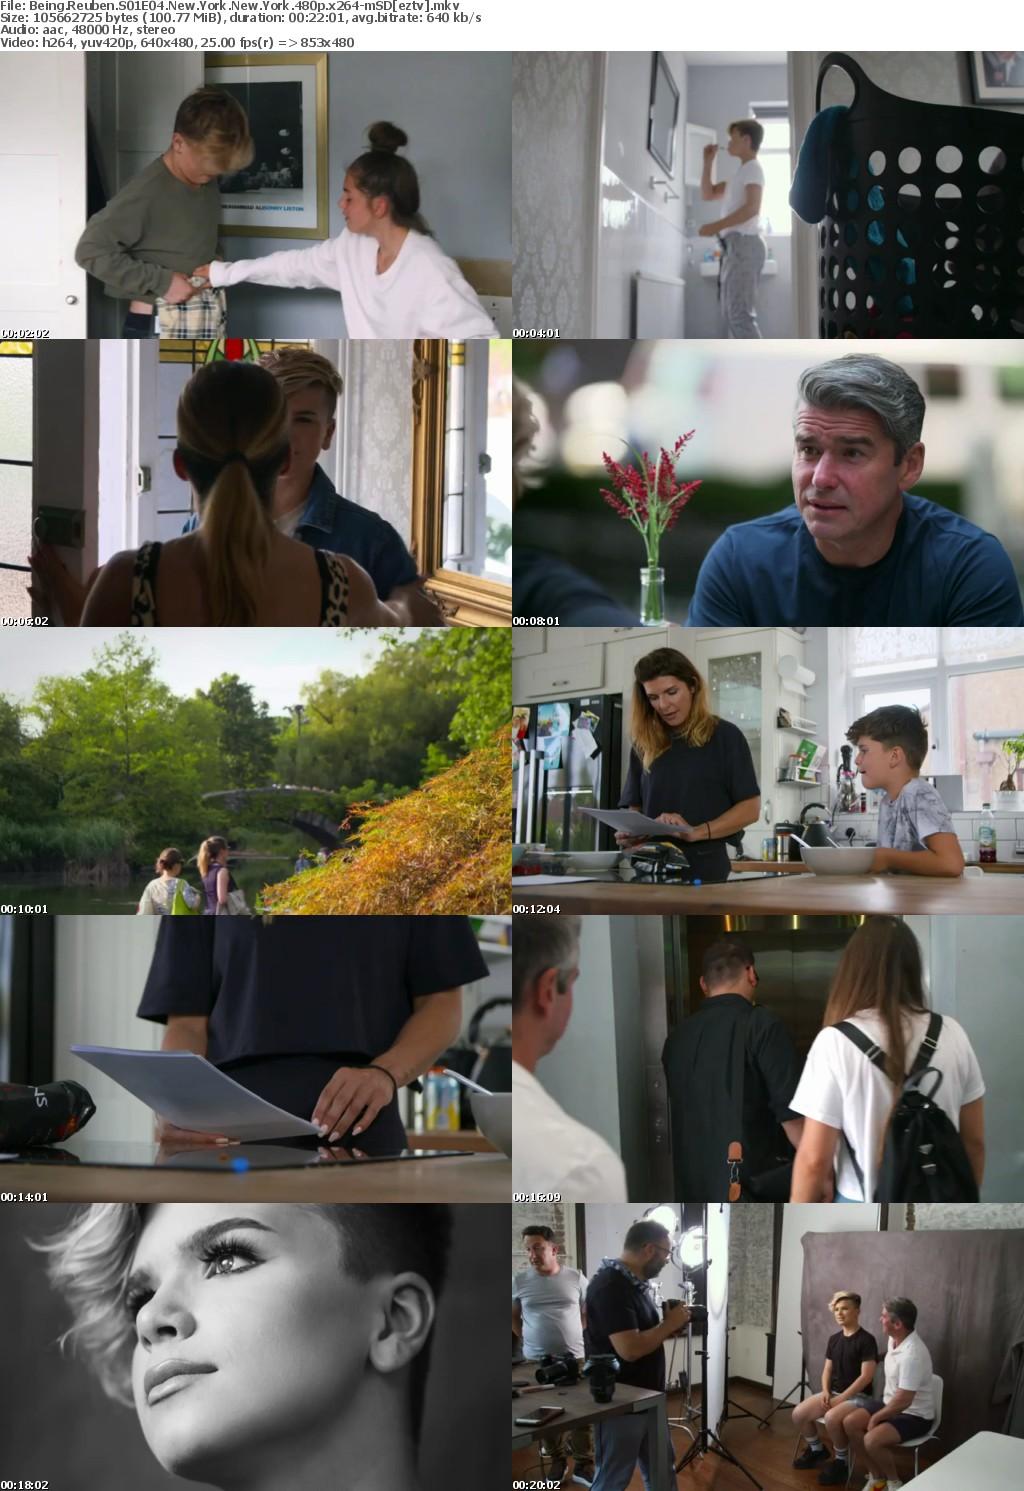 Being Reuben S01E04 New York New York 480p x264-mSD